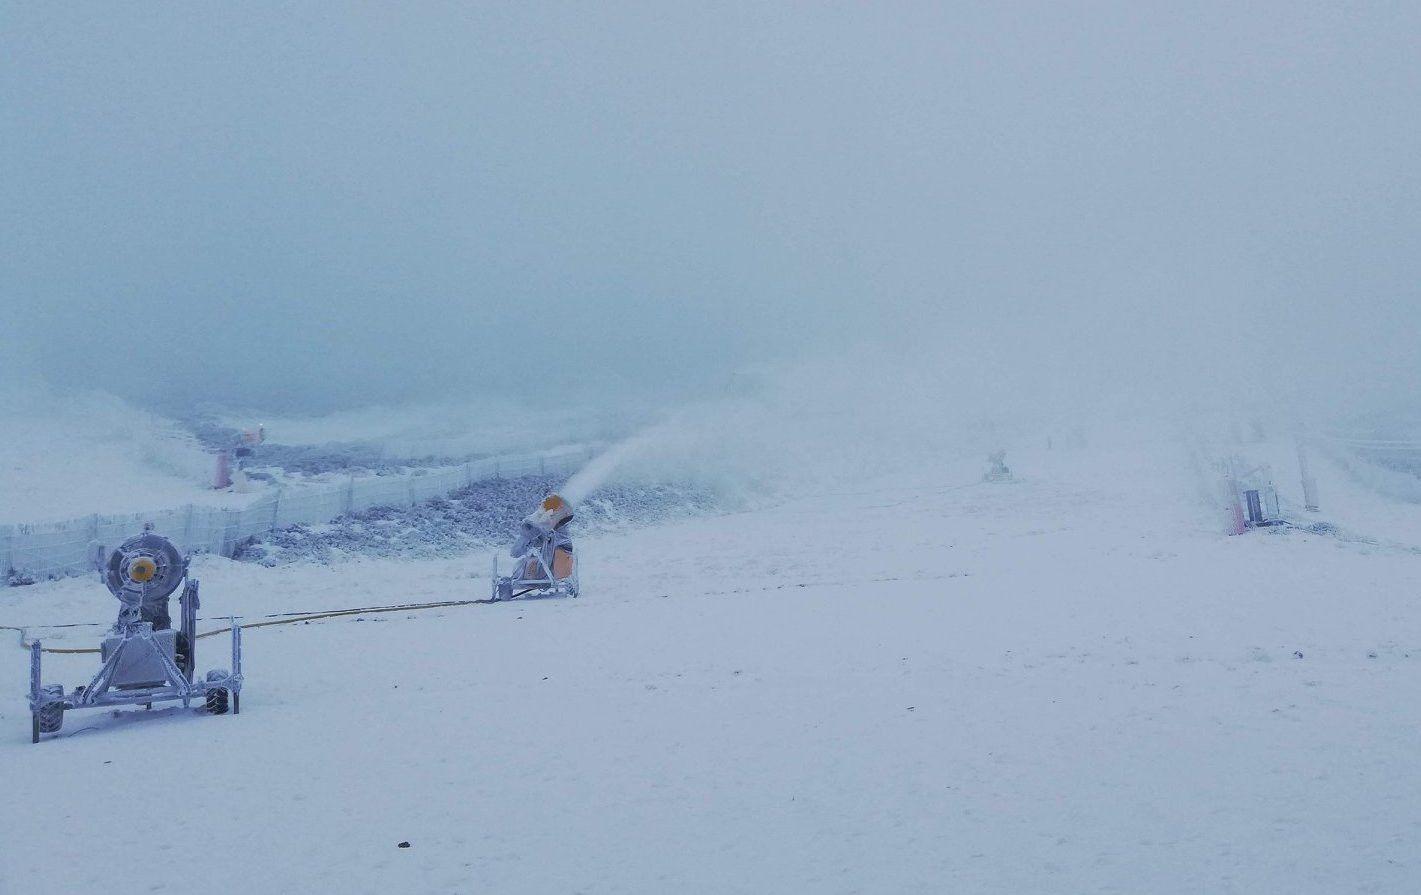 Nieve covatilla